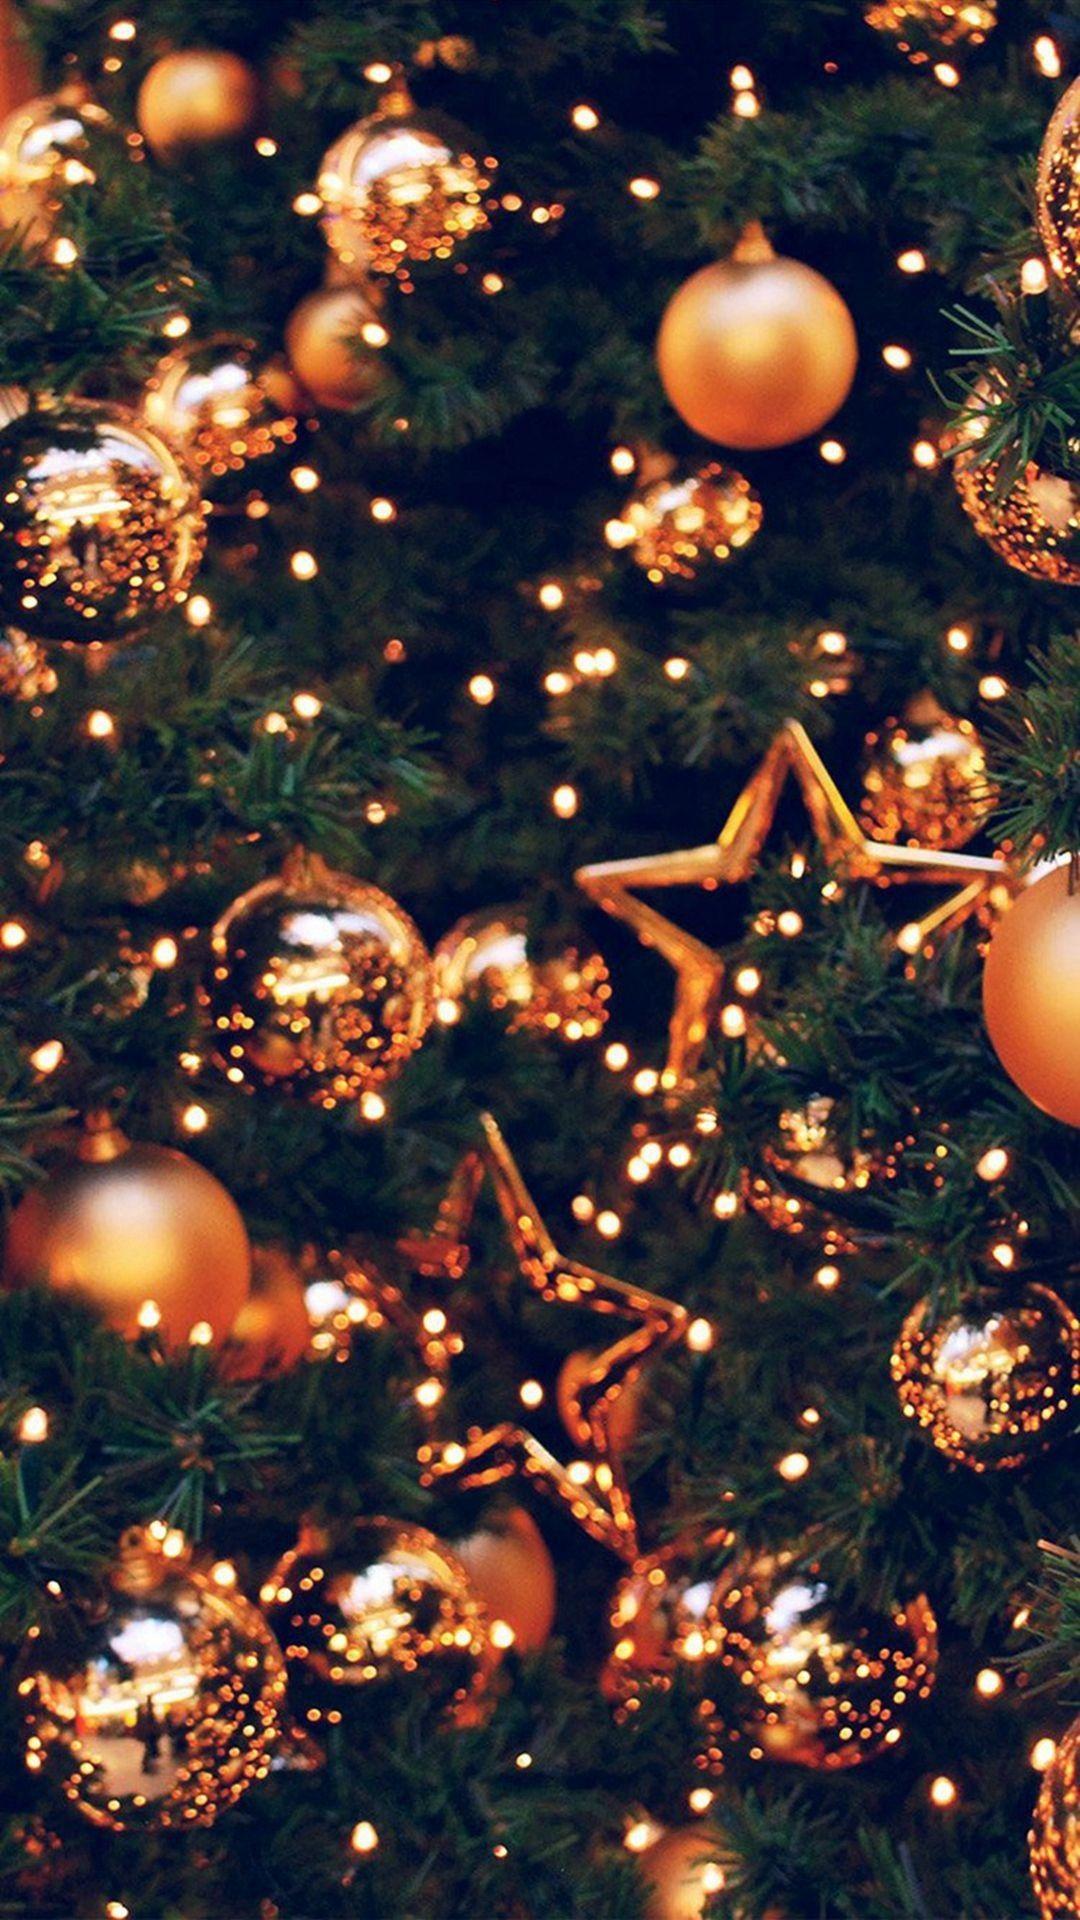 1080x1920 Christmas Wallpaper Hd Christmas Lockscreen Christmas Wallpape Christmas Tree Wallpaper Iphone Wallpaper Iphone Christmas Christmas Phone Wallpaper